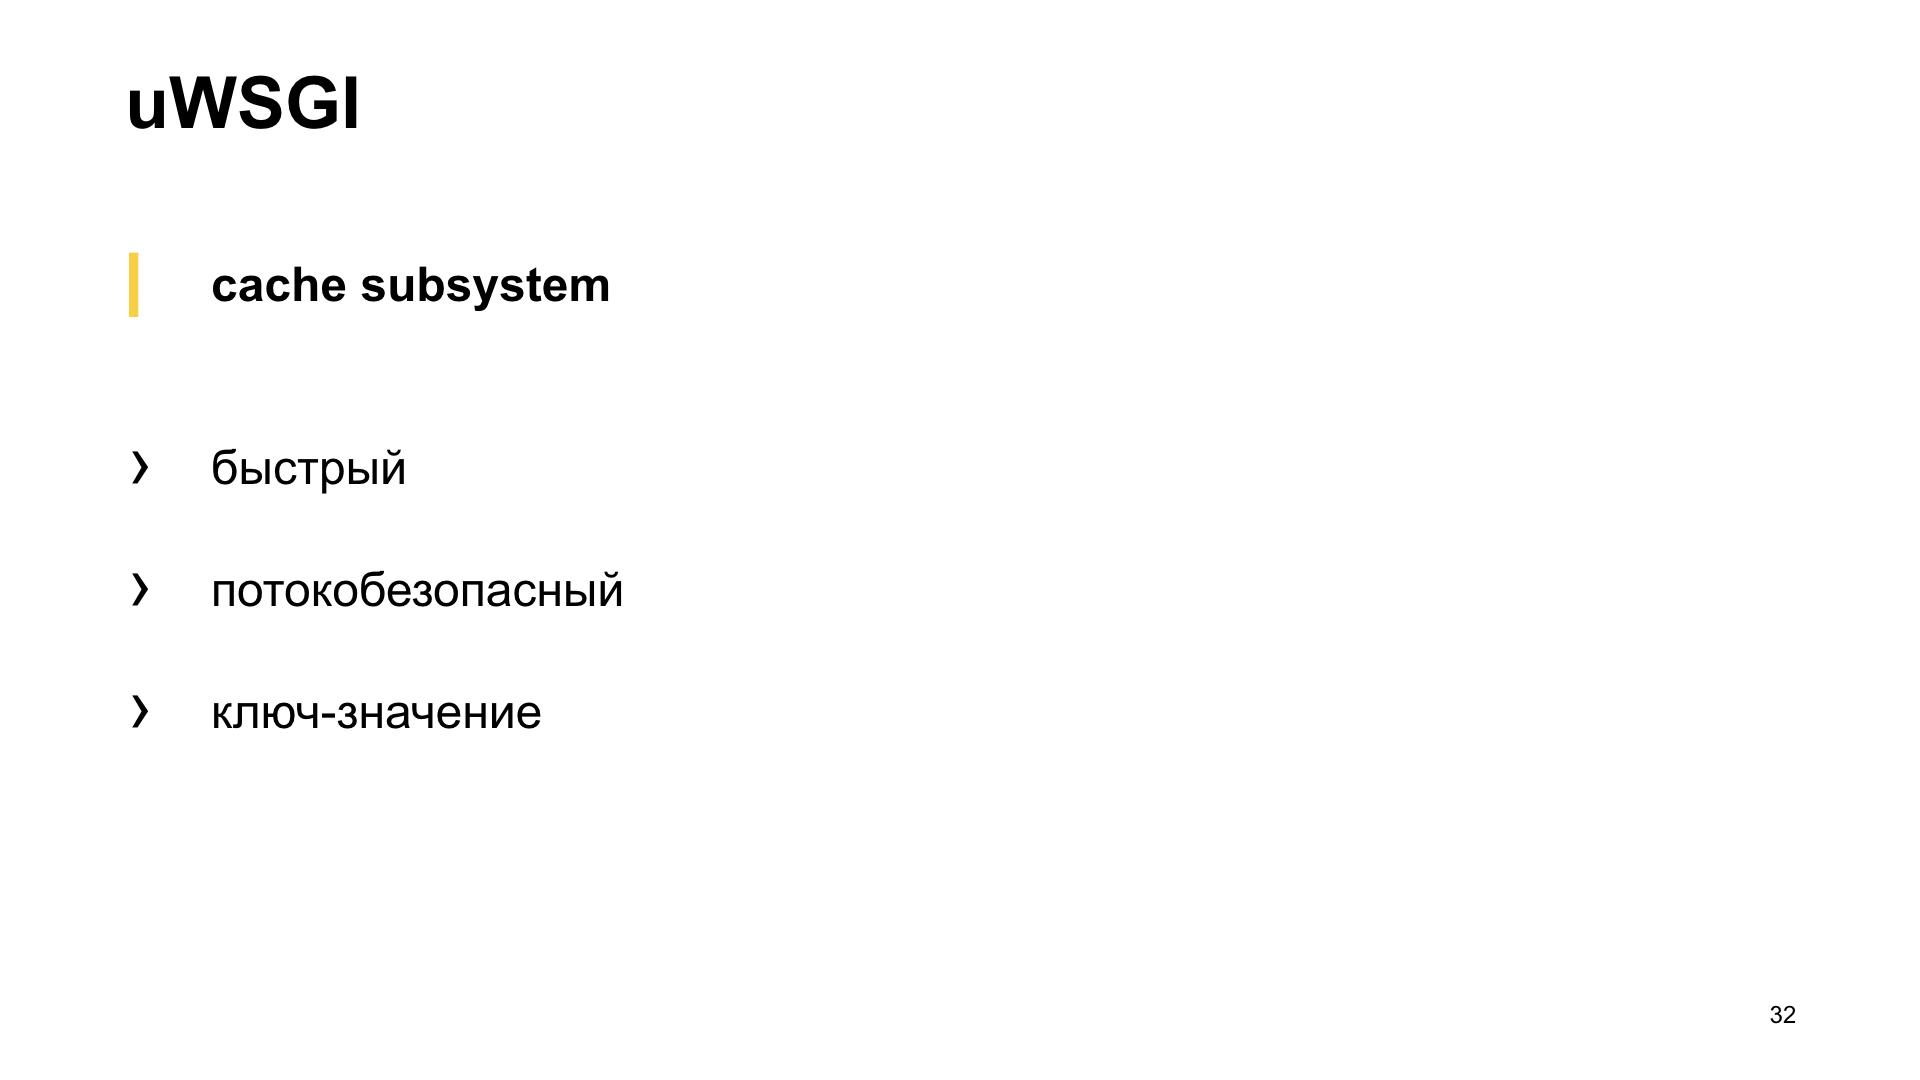 uWSGI в помощь метрикам. Доклад Яндекса - 24